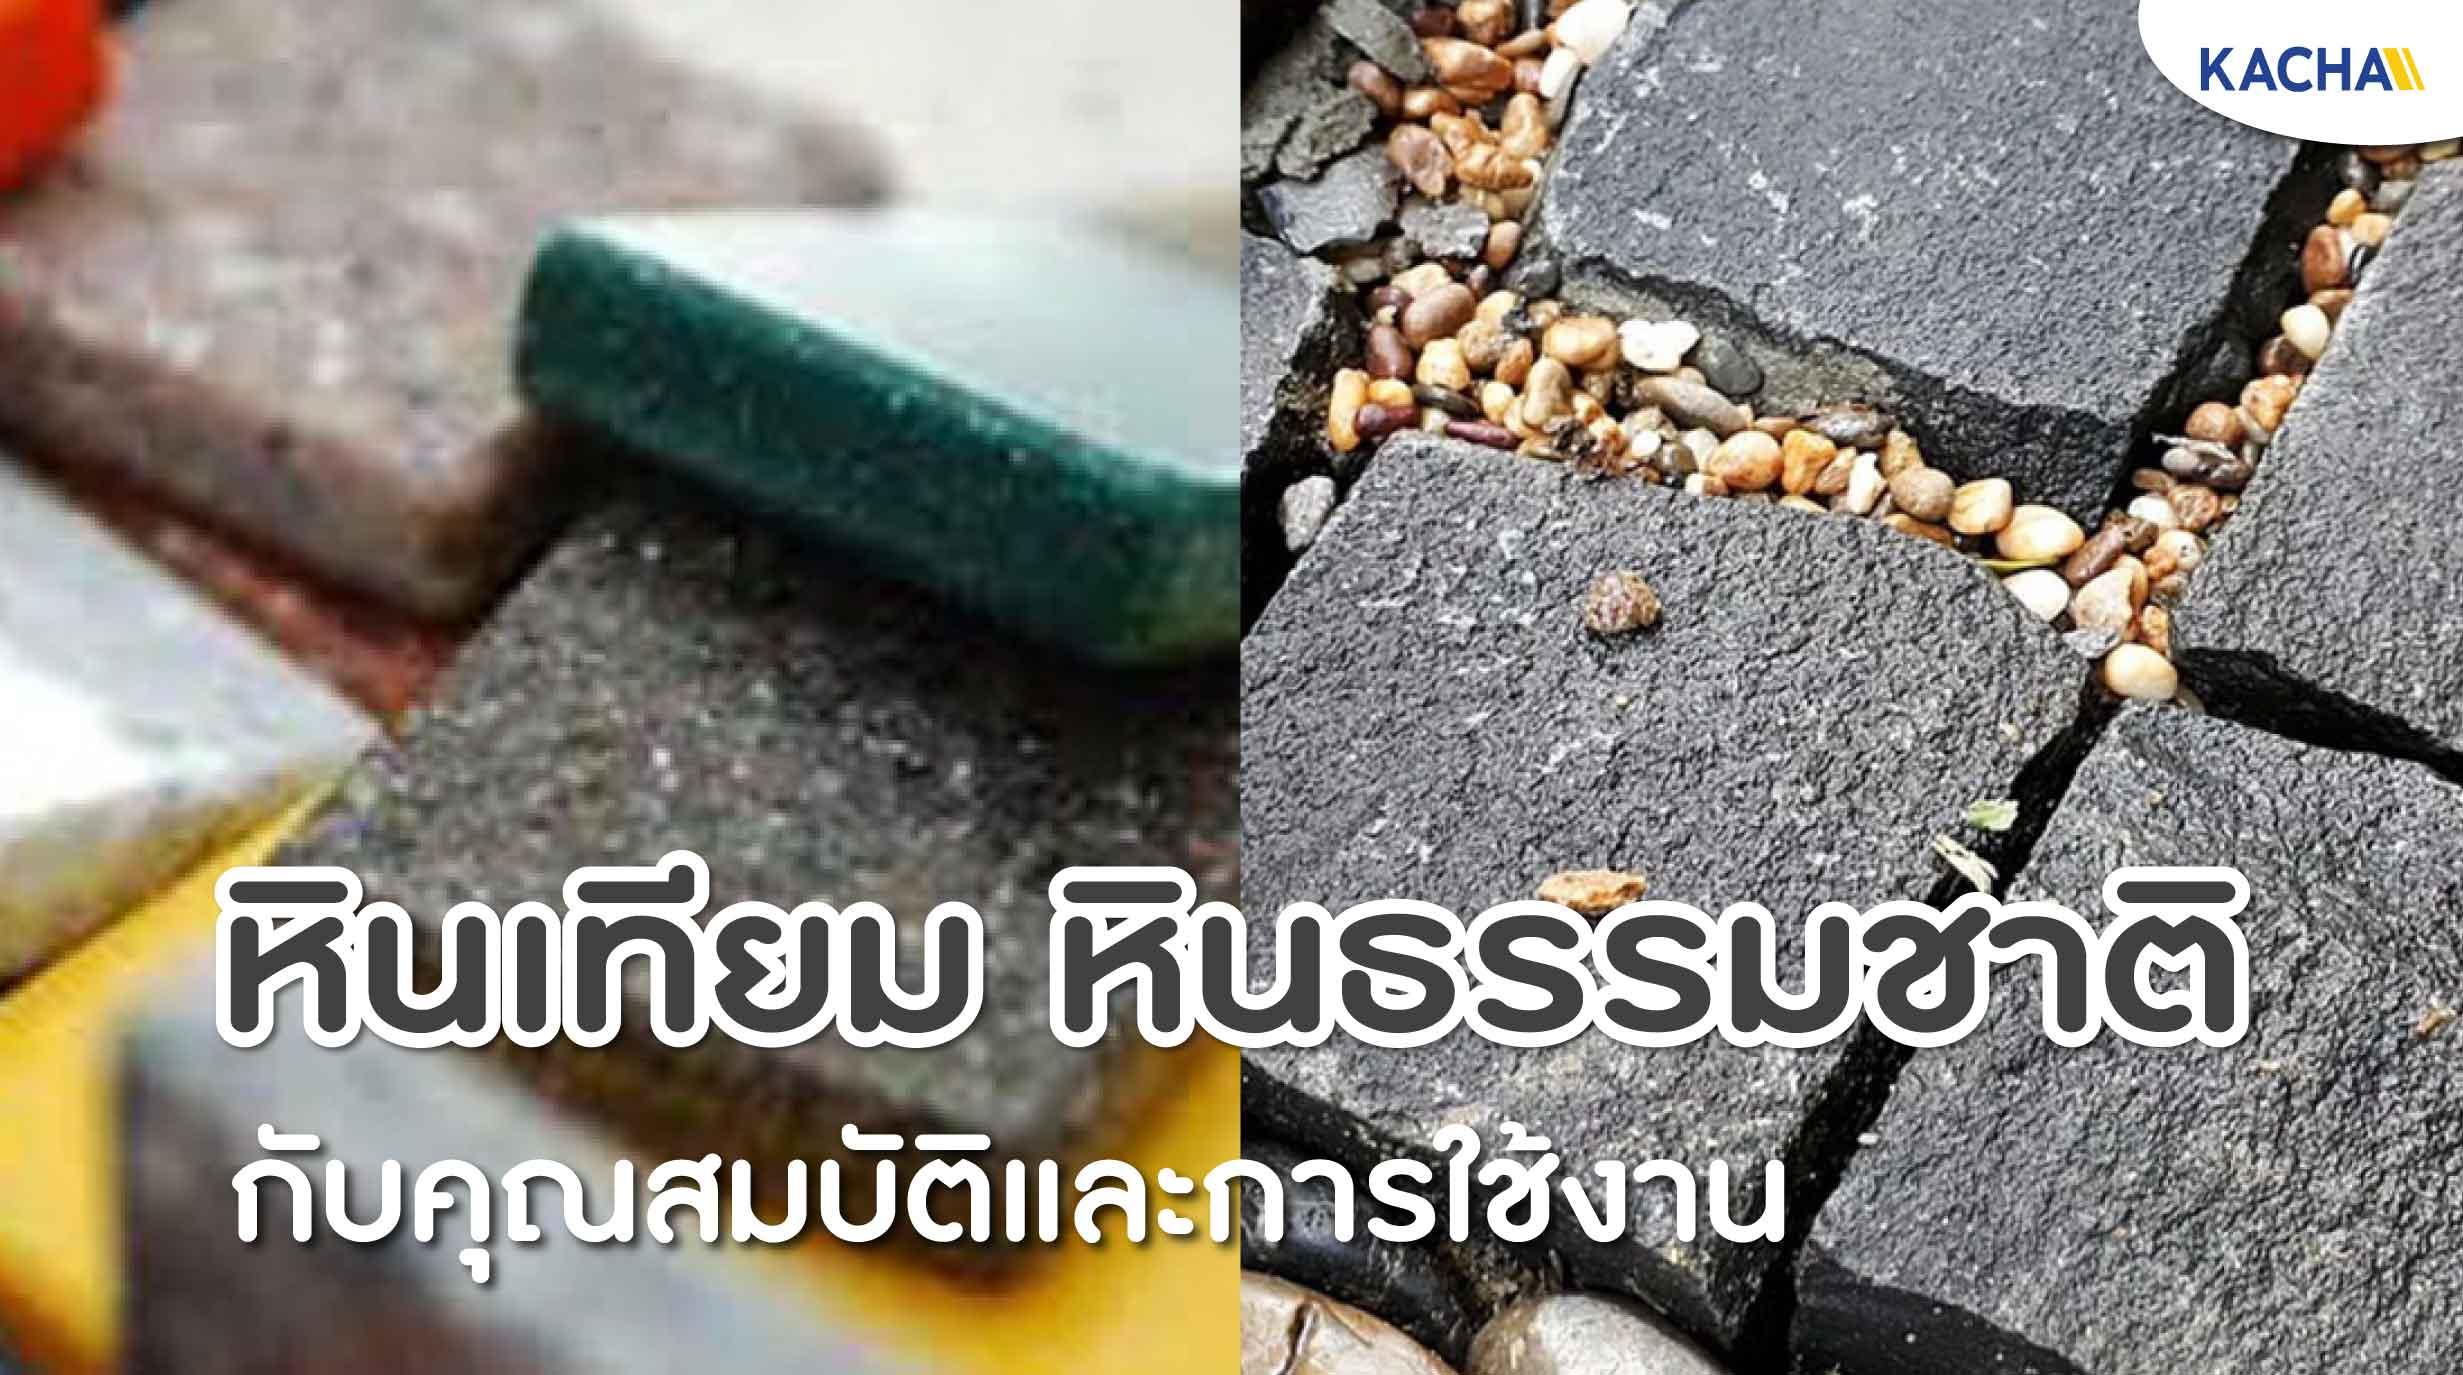 210508-Content-หินเทียม-หินธรรมชาติ-คุณสมบัติน่ารู้-ก่อนนำไปใช้งาน01